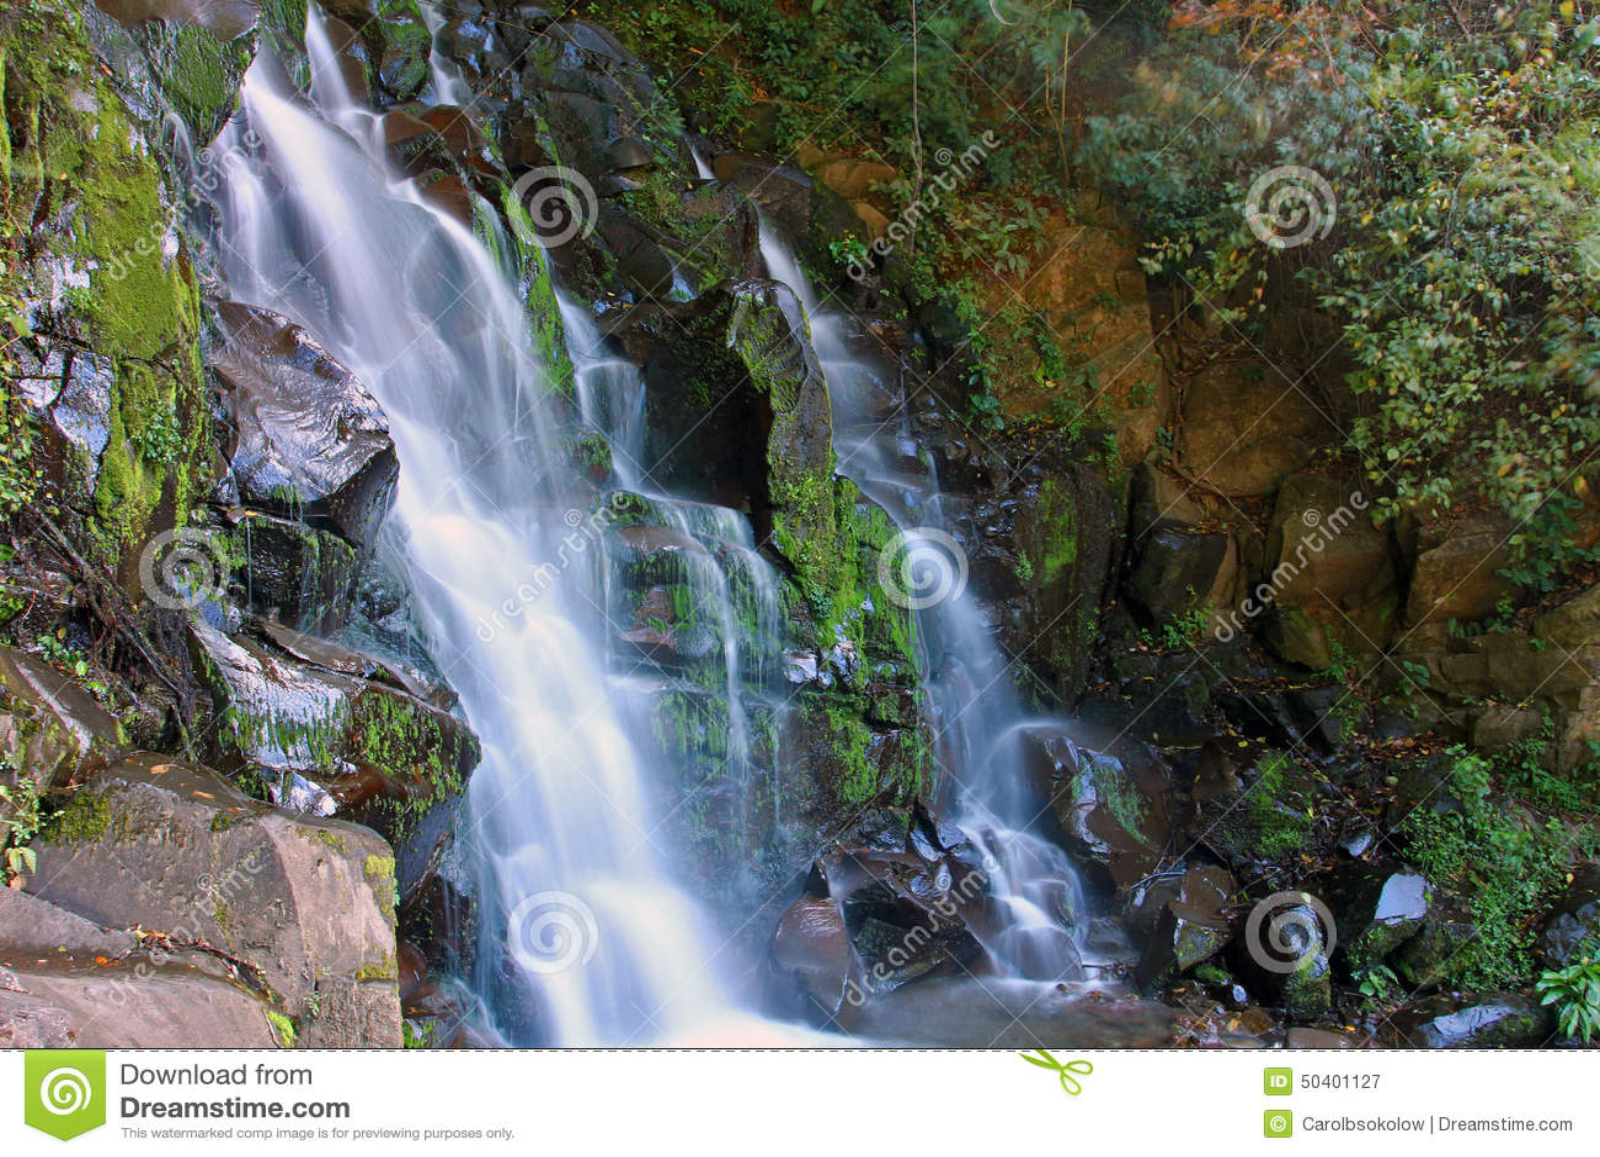 San Ramon Waterfall, Boquete, Chiriqui, Panama